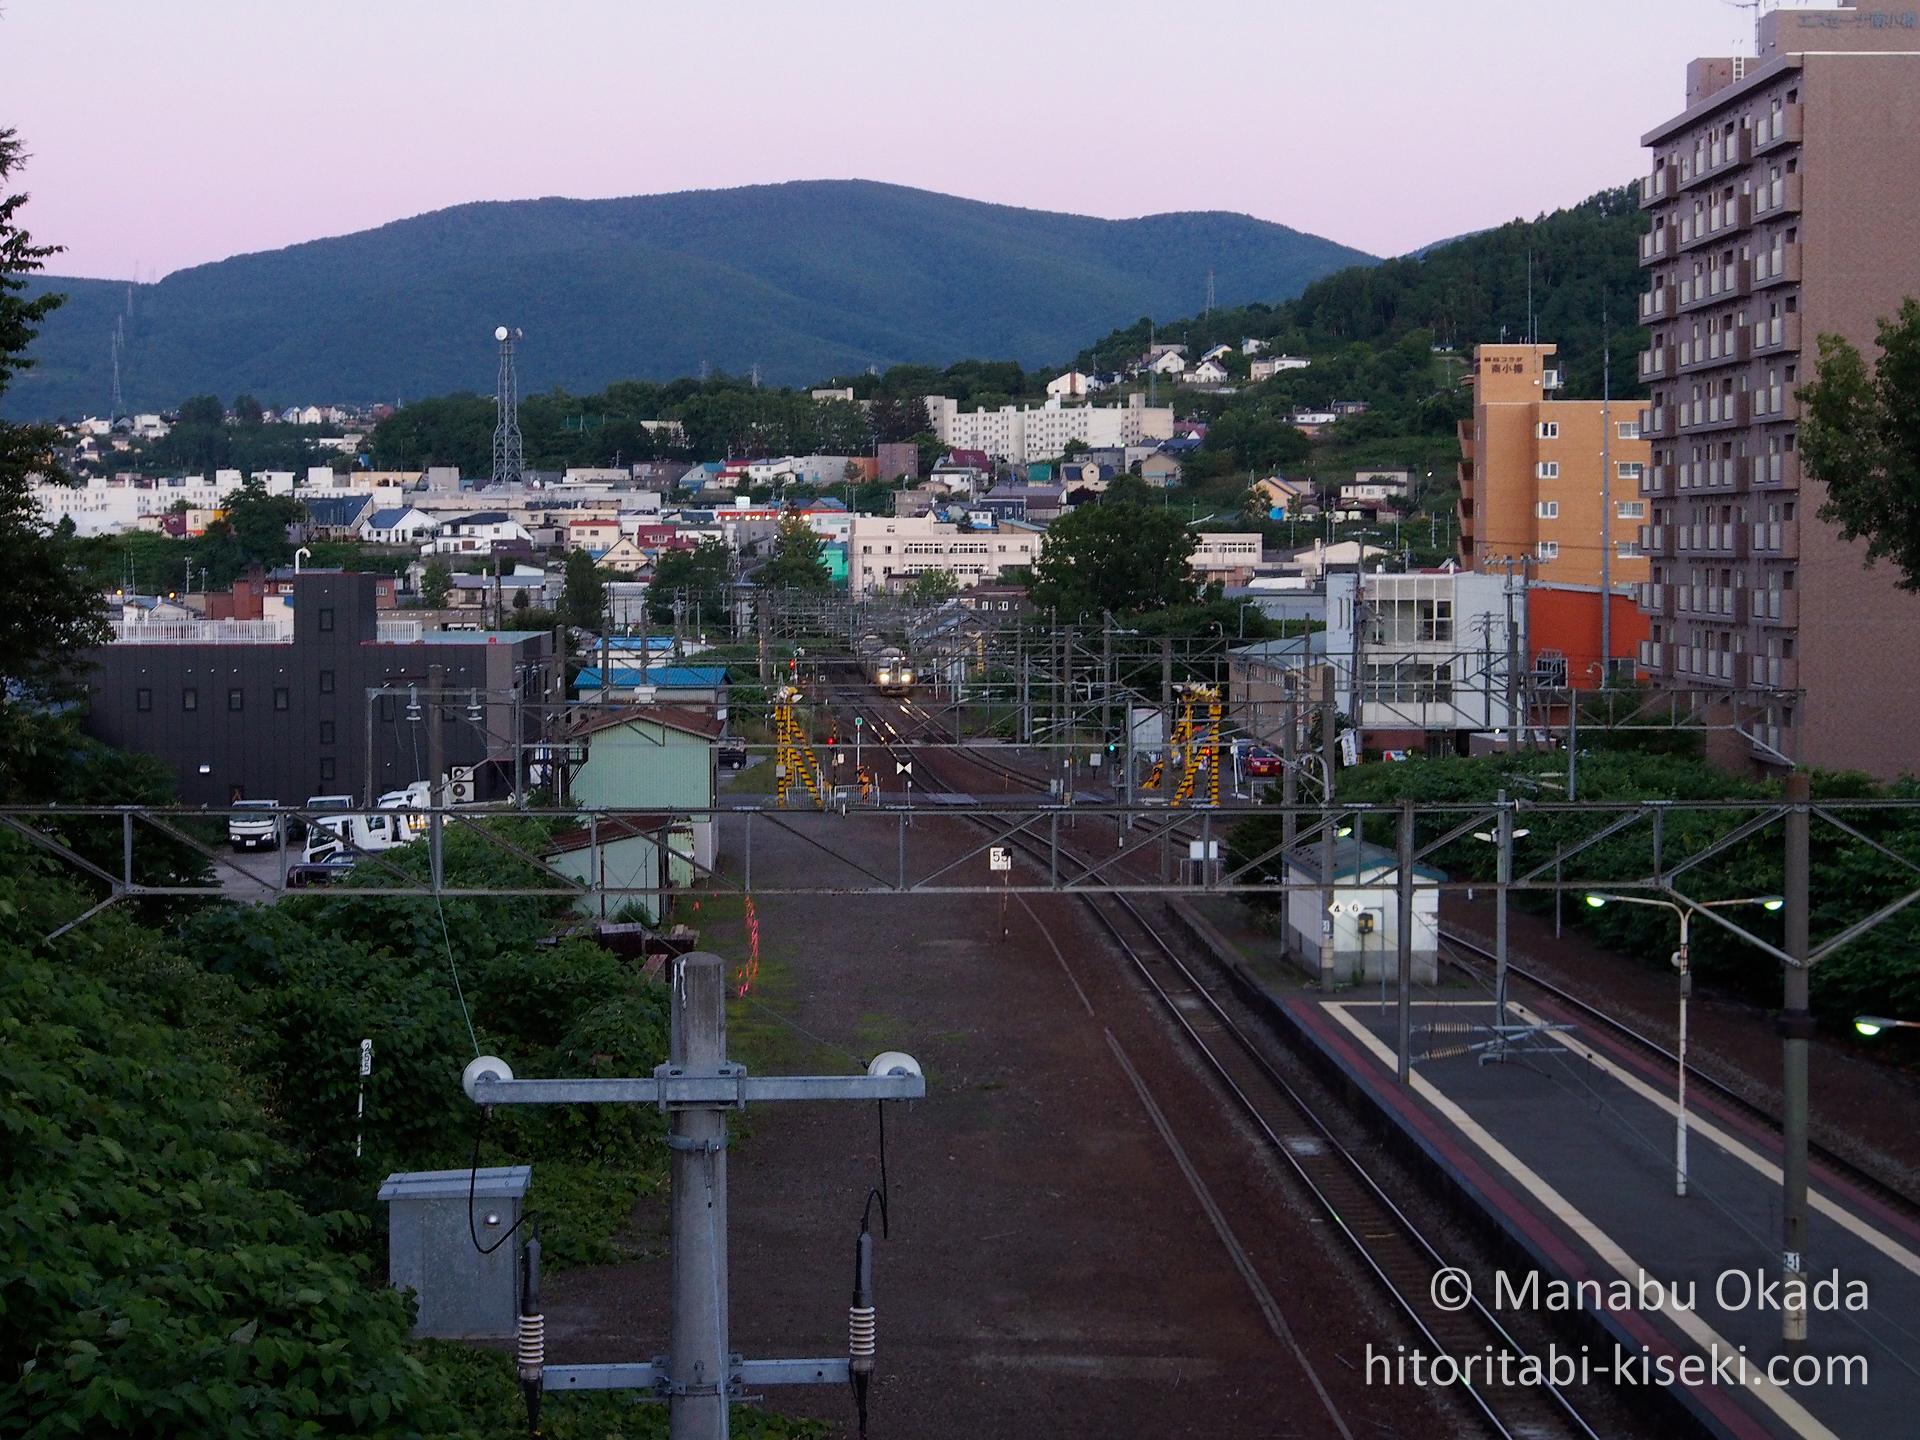 south-otaru-station-01.jpg